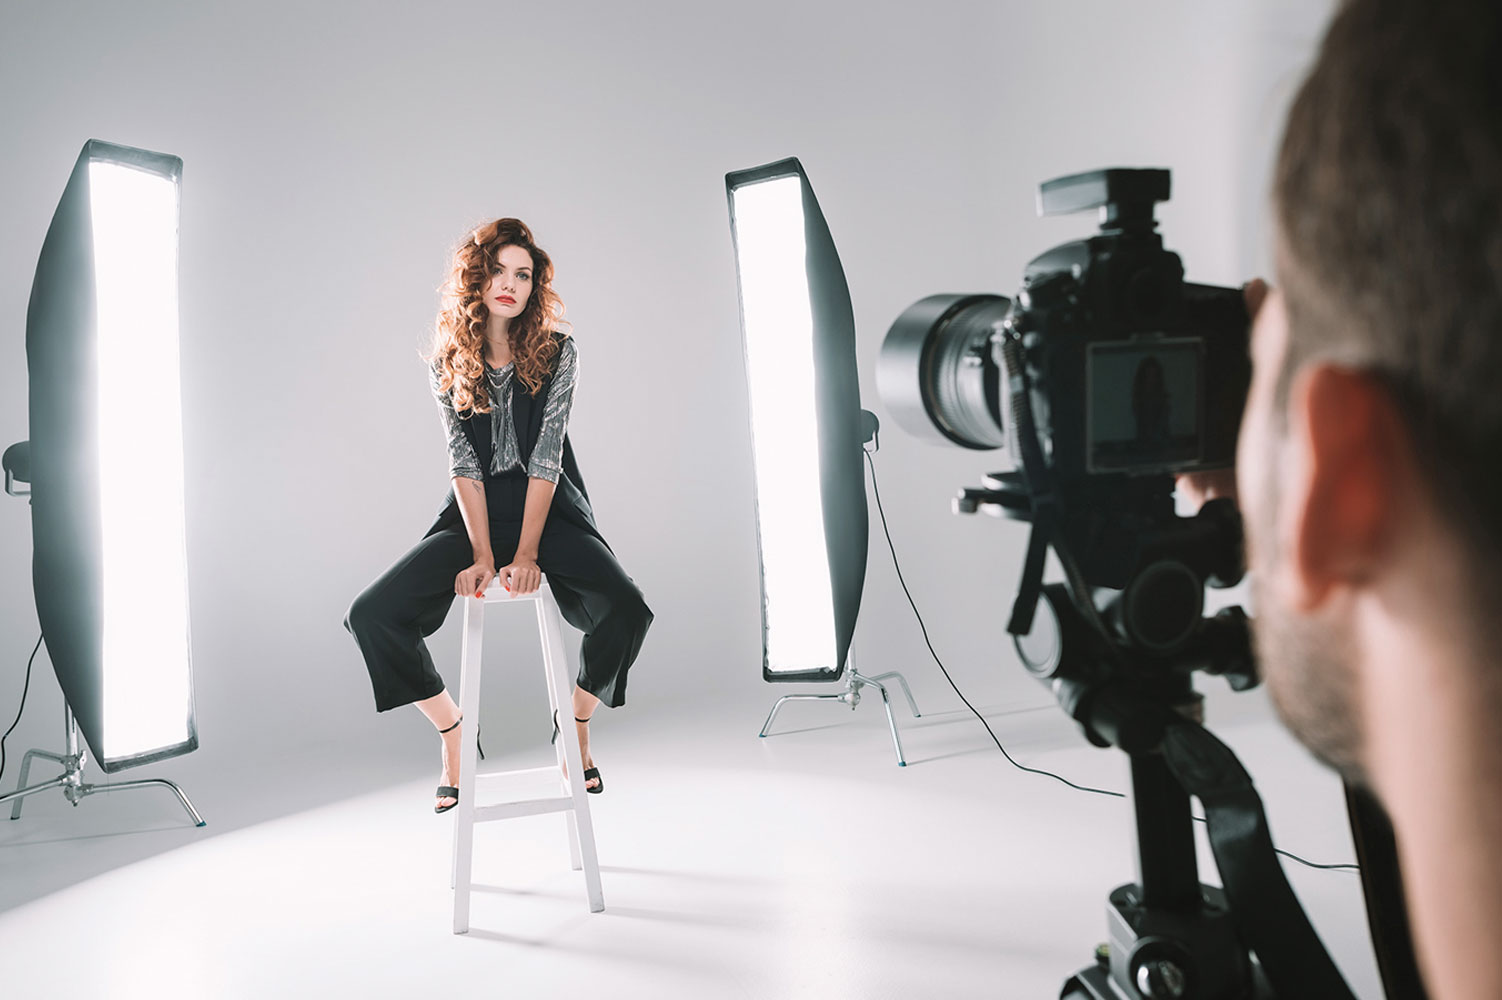 photography entrepreneur